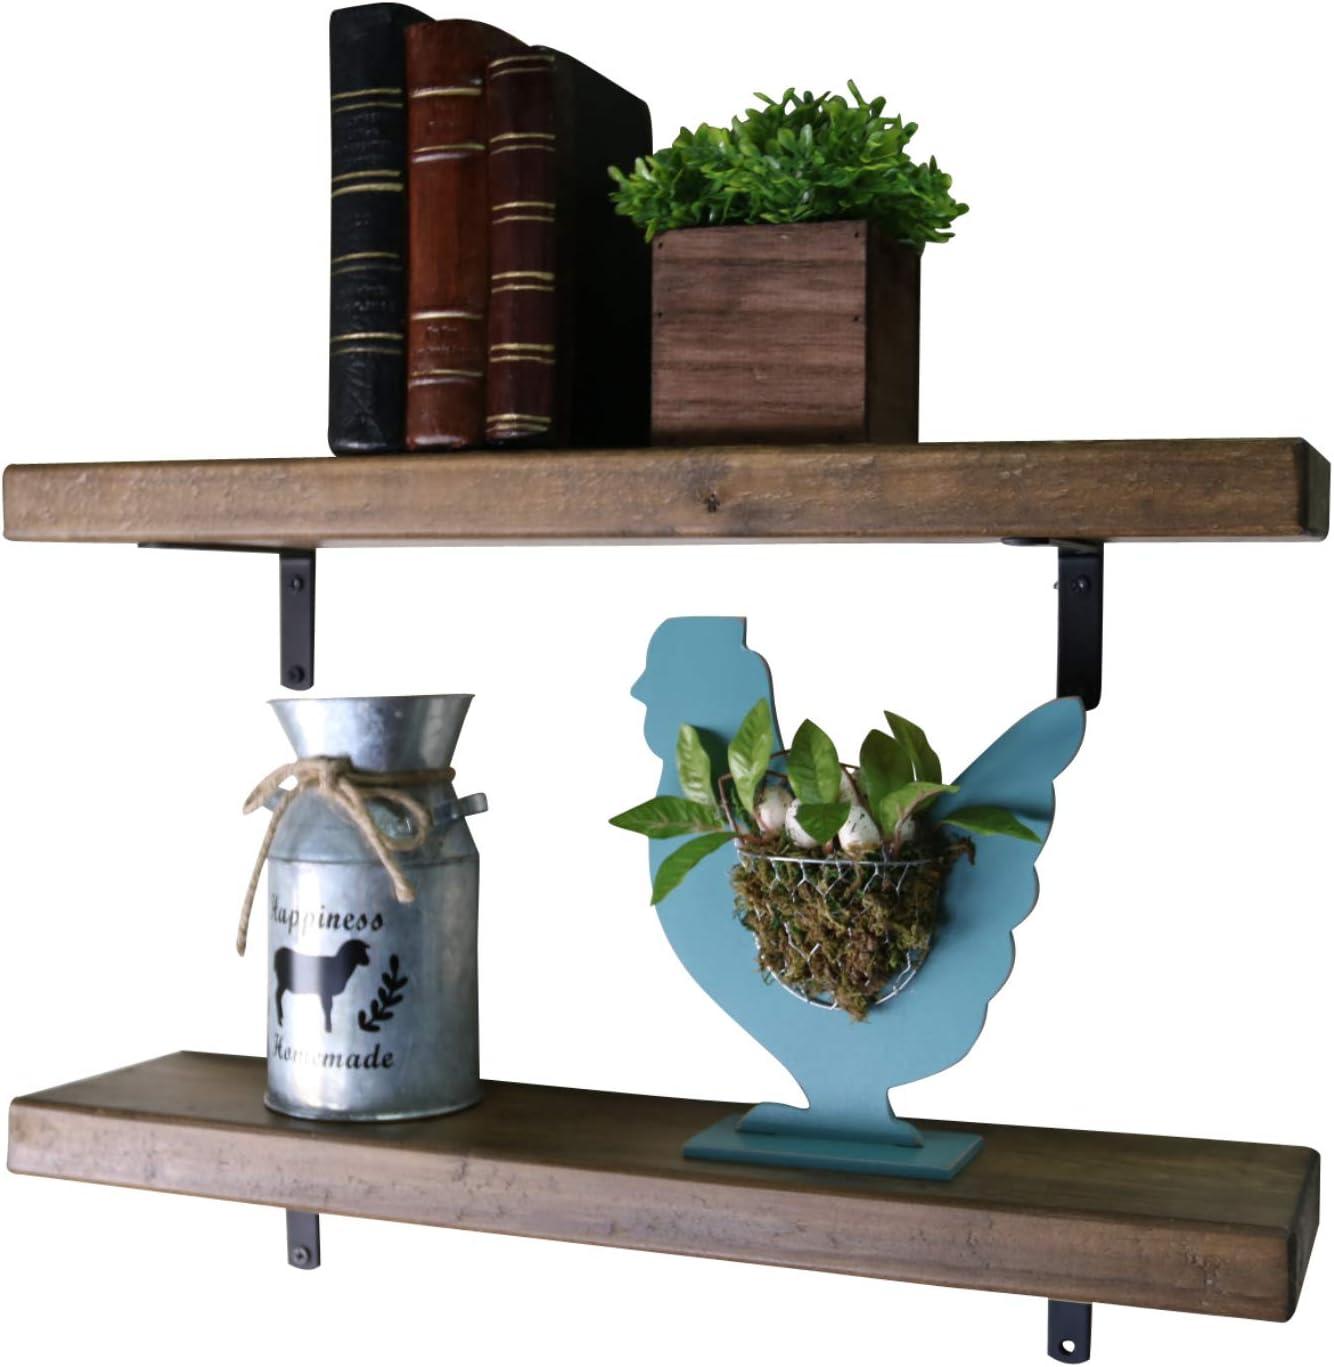 farmhouse decor shelf storage Floating Shelf with divider and sliding doors rustic home decor floating media console wood shelf